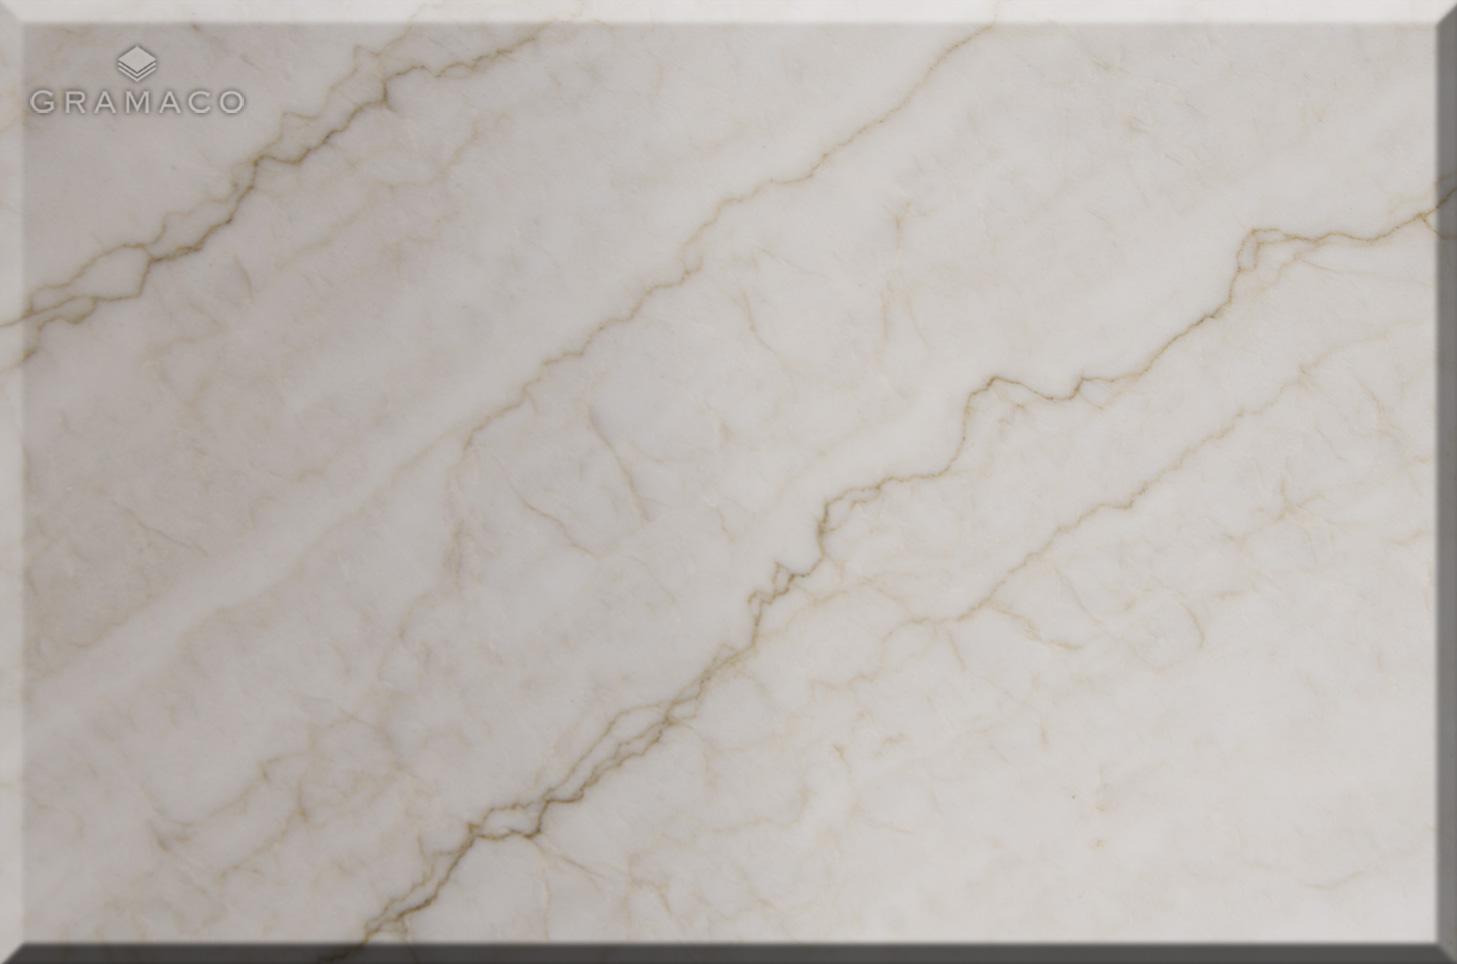 Gramaco Maryland Distributor Granite Marble Quartz